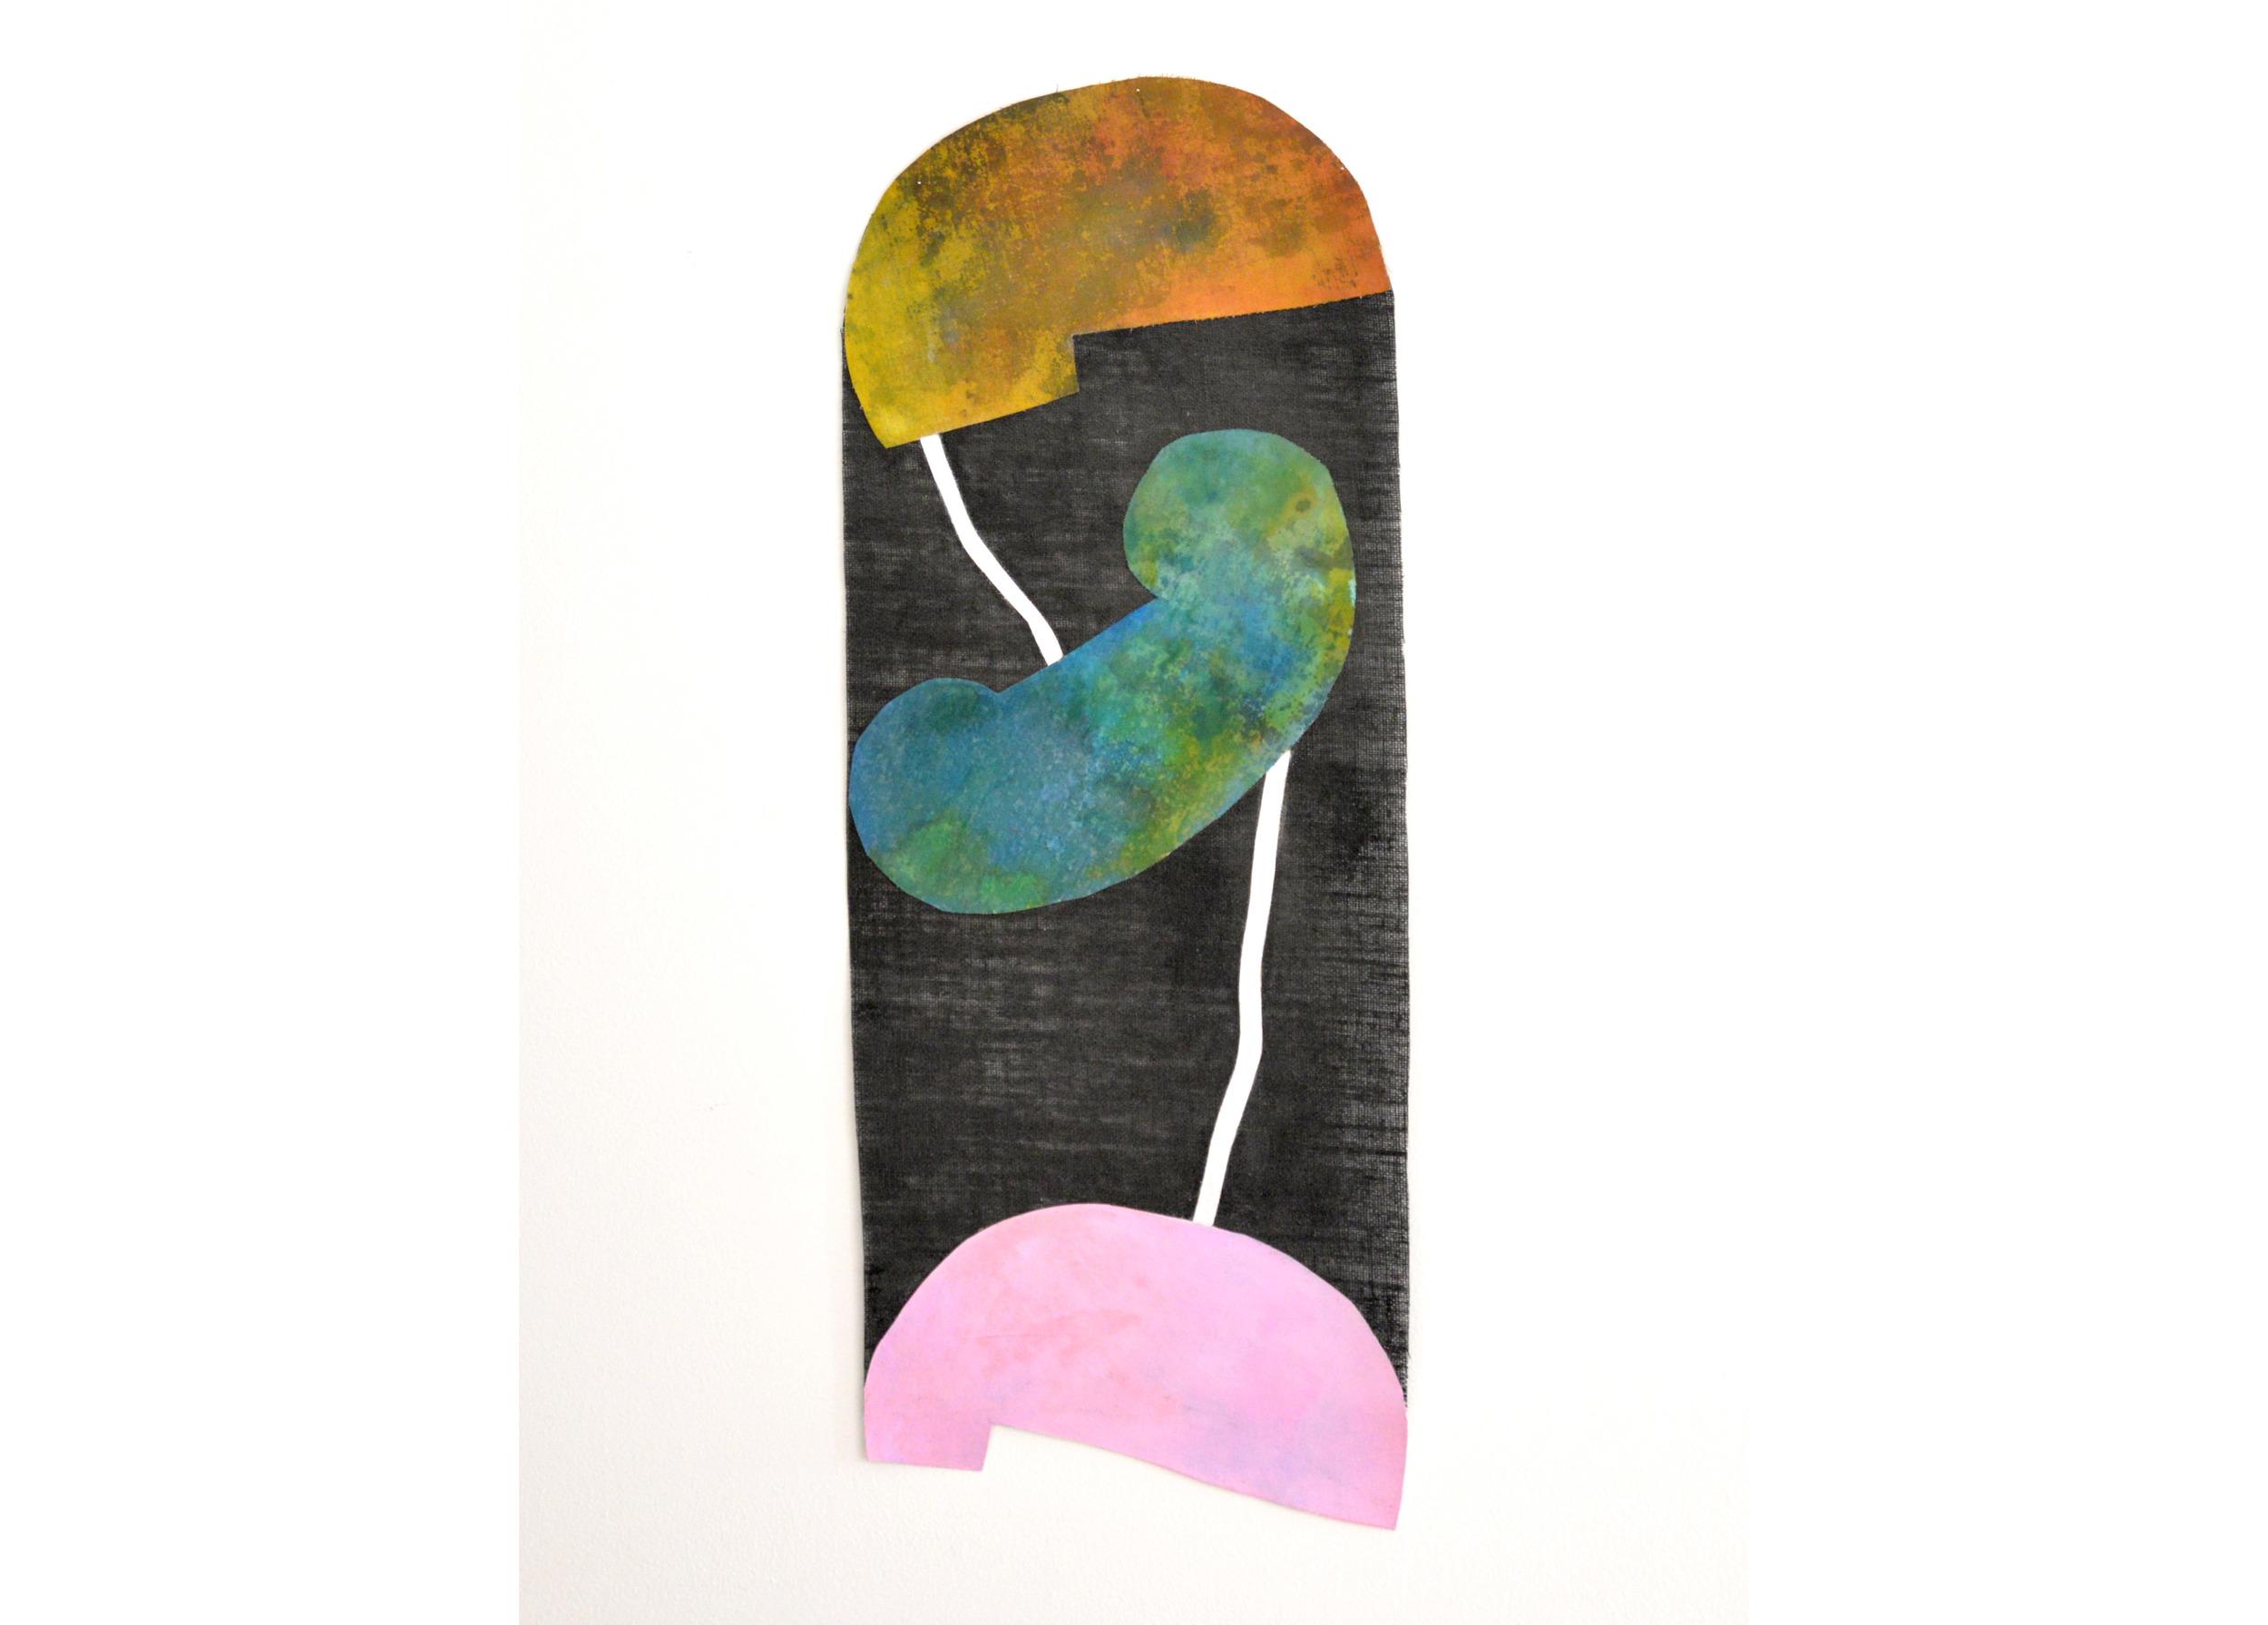 "Study for Head Heart Hand, Acrylic on jute and canvas, 38.5"" x 13"", 2016"